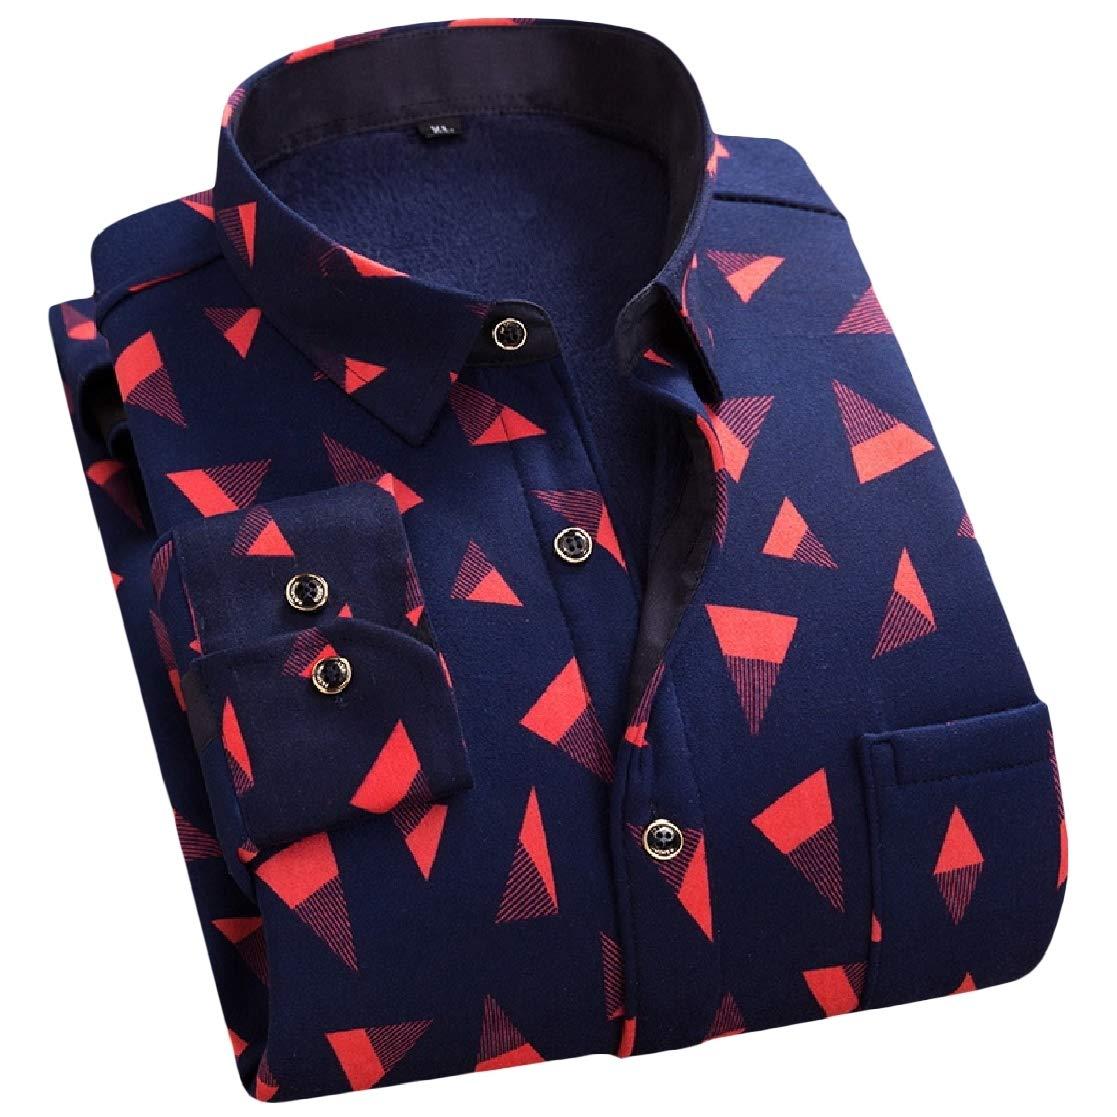 YUNY Mens Office Plaid Thickening Comfort Plus Velvet Dress Shirt Pattern15 2XL